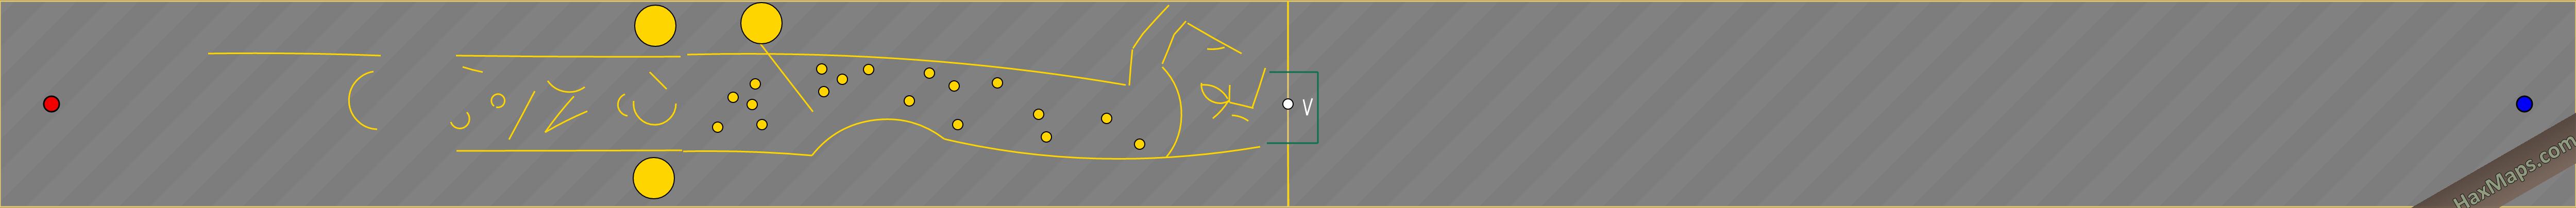 hax ball maps | Orange Very Easy